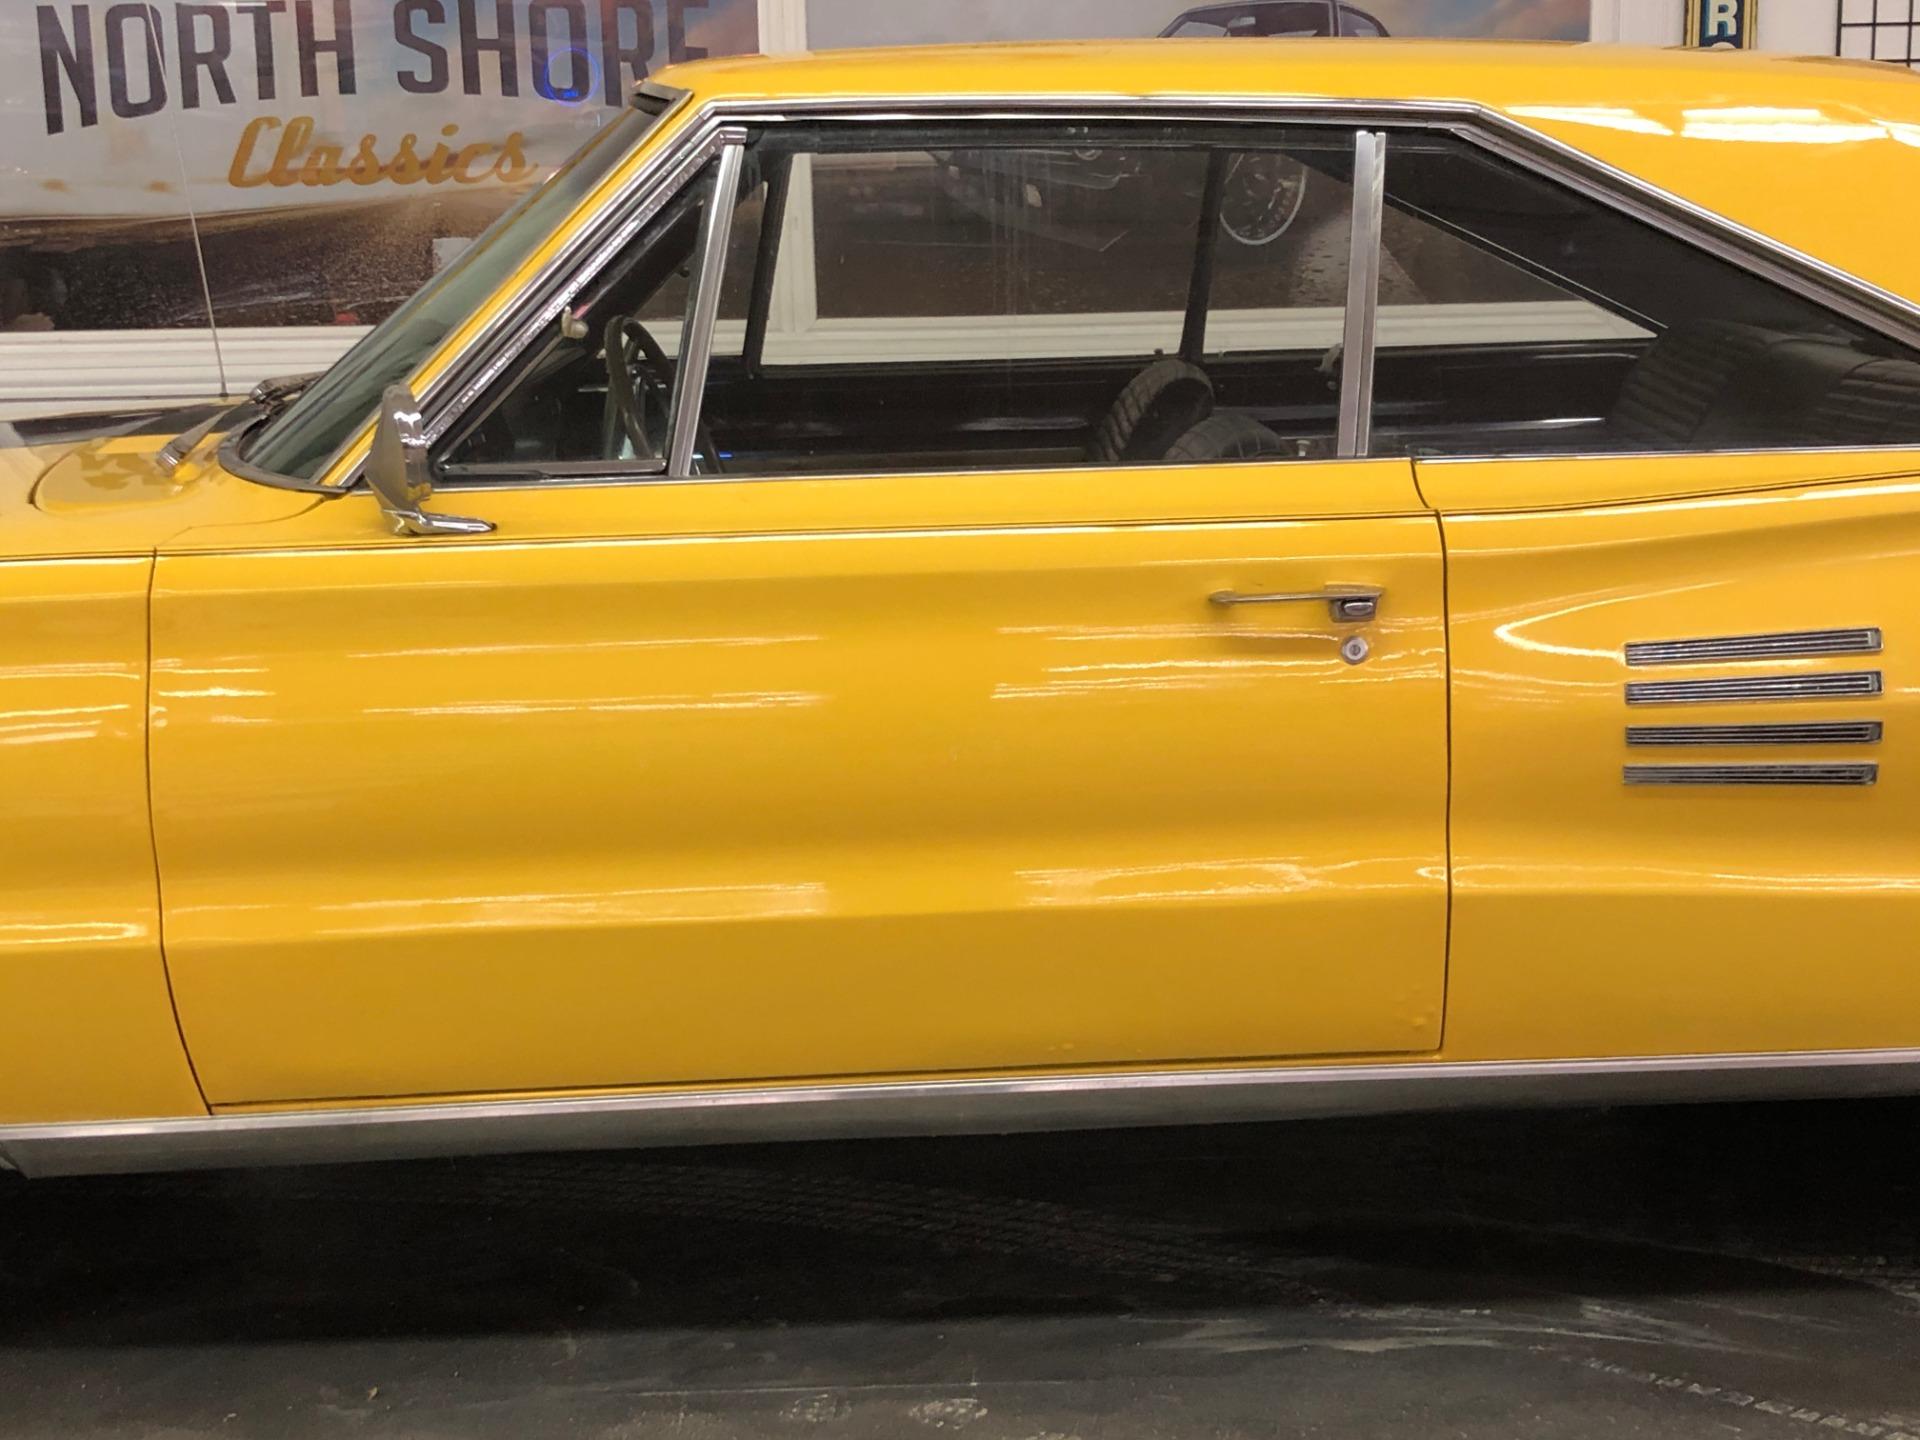 Used 1966 Dodge Coronet -318 V8 4BBL-727 TORQUE FLIGHT-AUTO-MOPAR DRIVER CLASSIC-VIDEO | Mundelein, IL